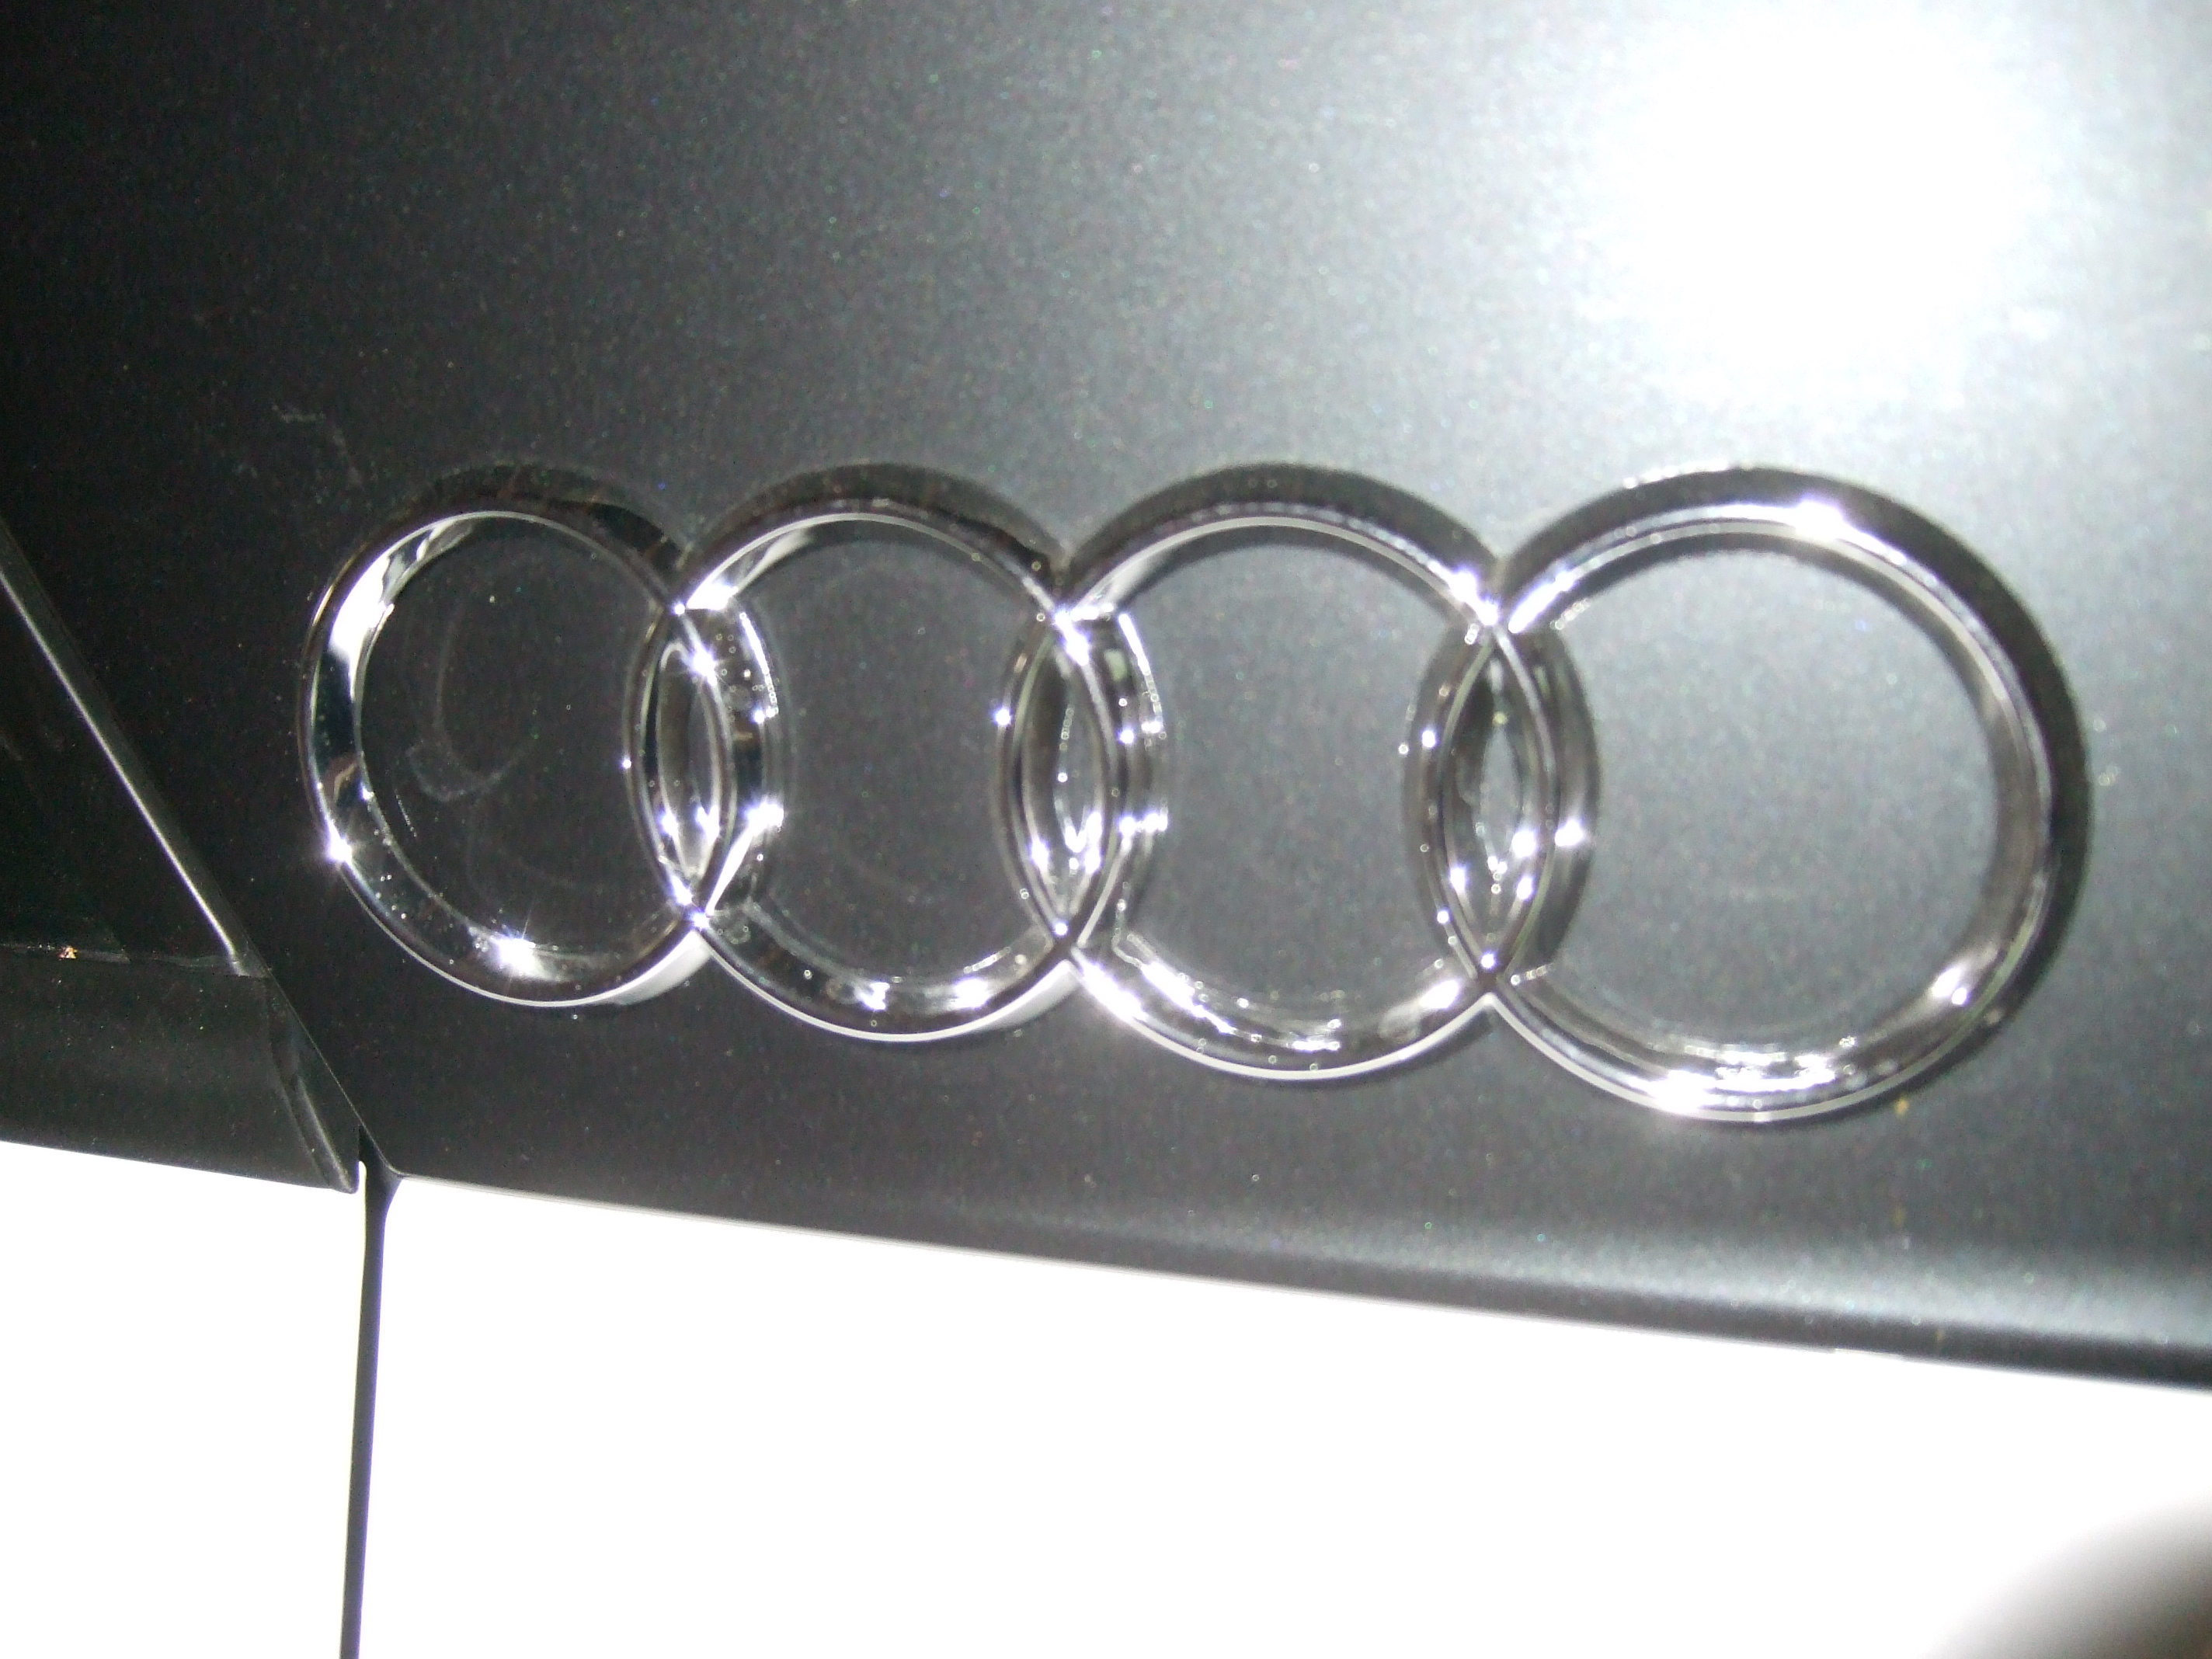 audi sticker emblem for blades - Audi Q2 Forums